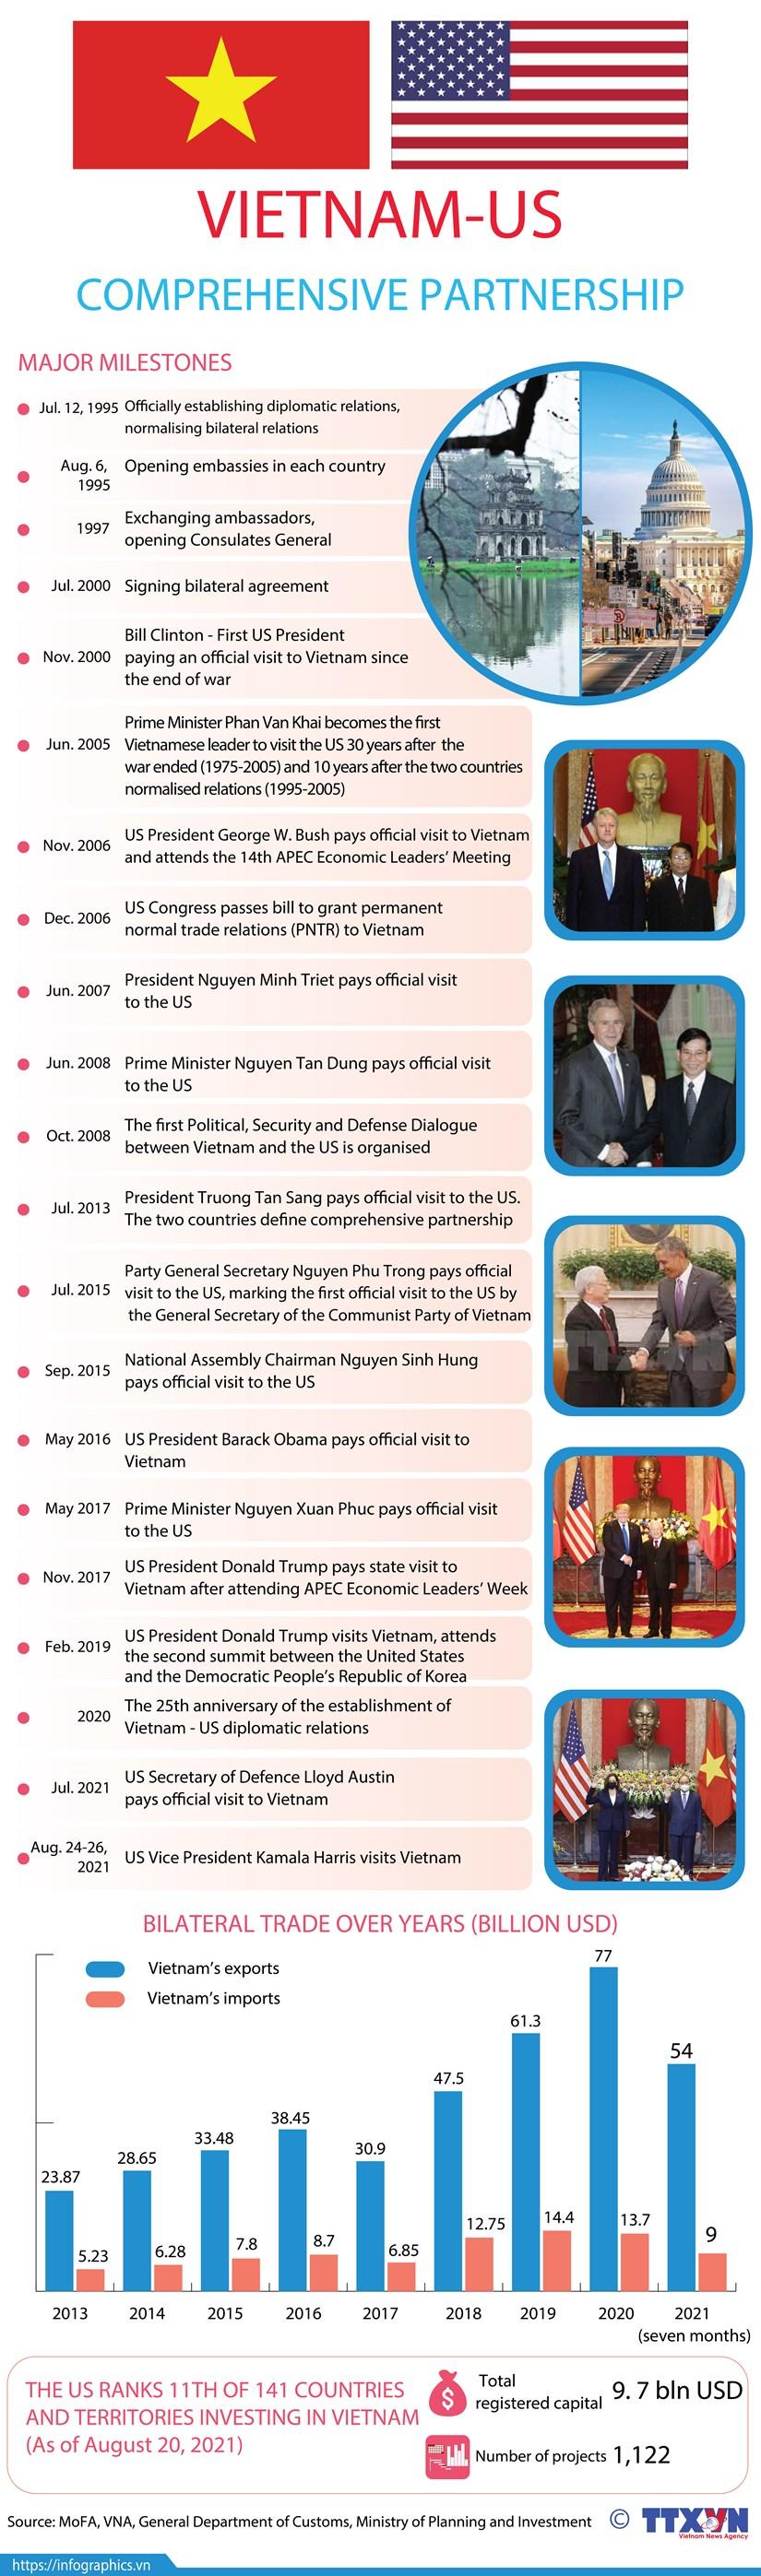 Vietnam - US comprehensive partnership hinh anh 1